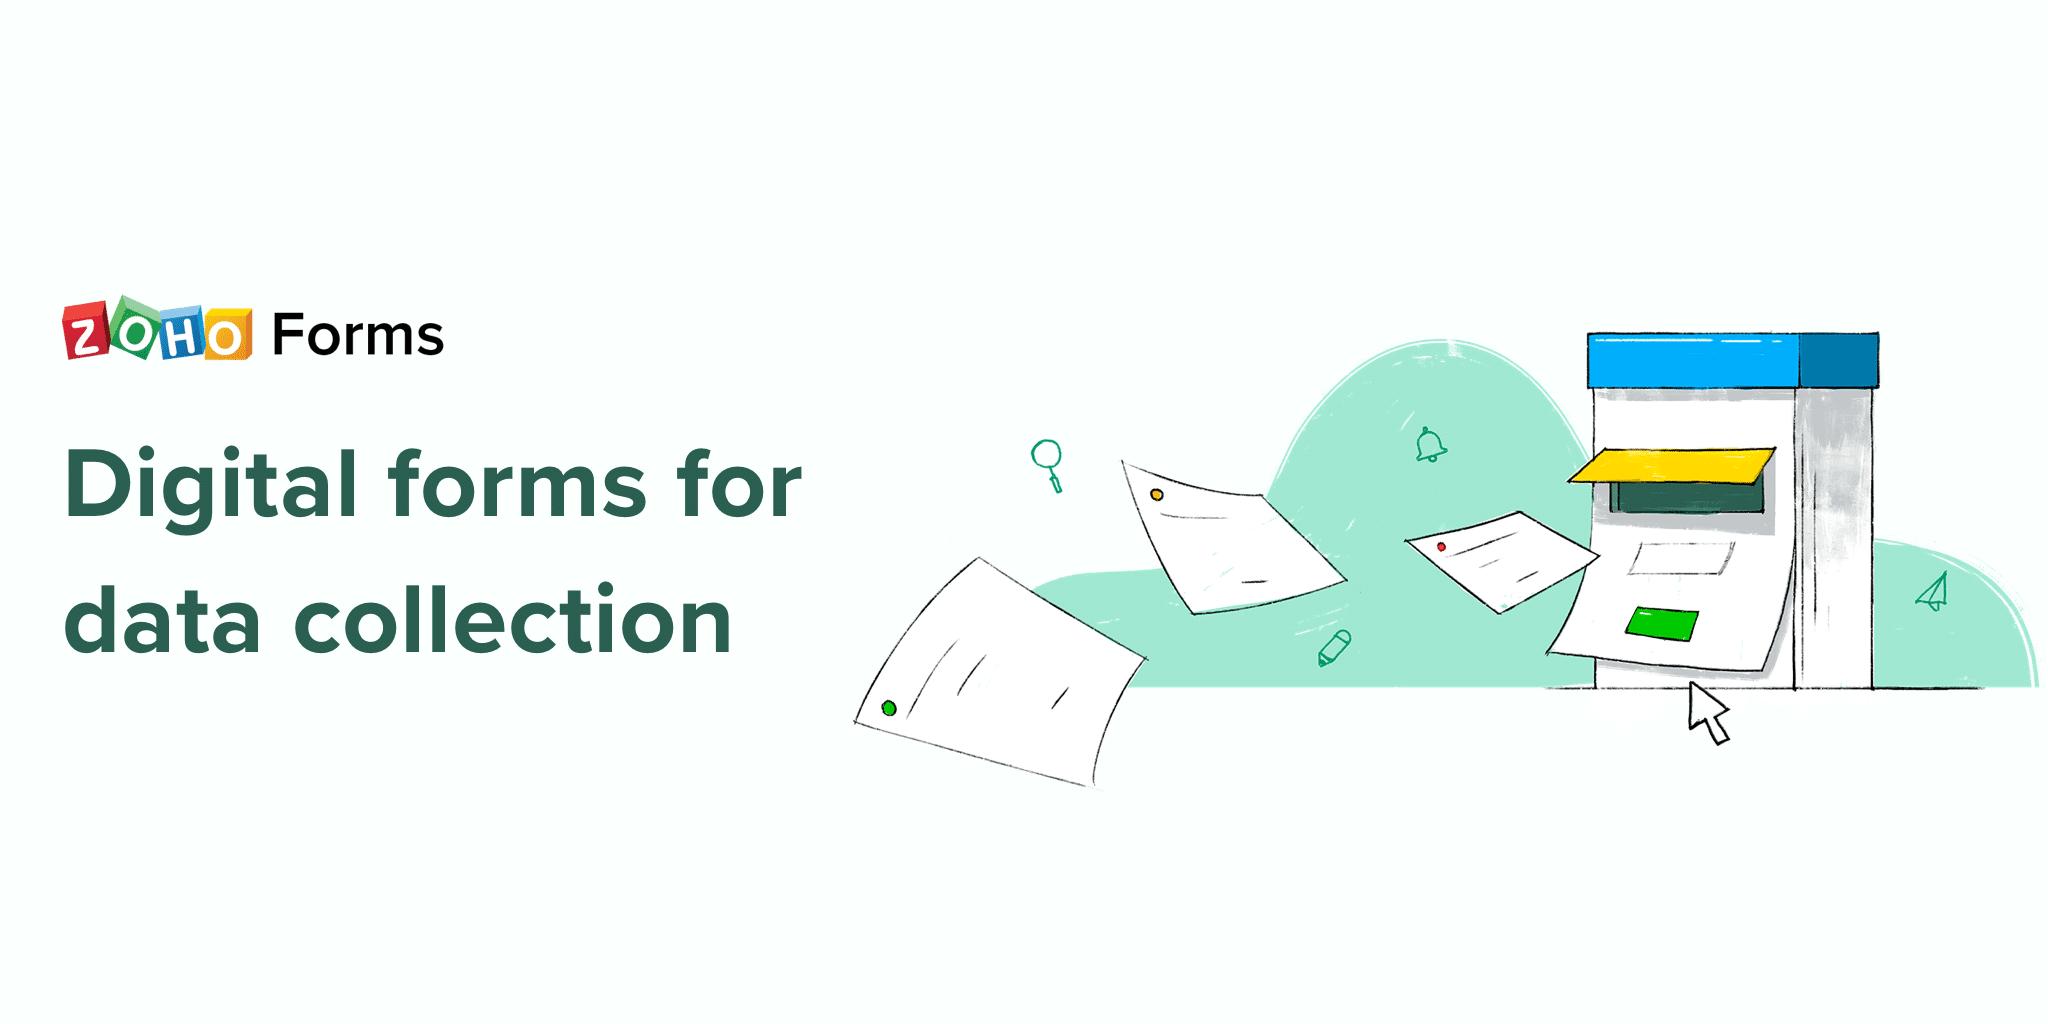 digital data collection methods